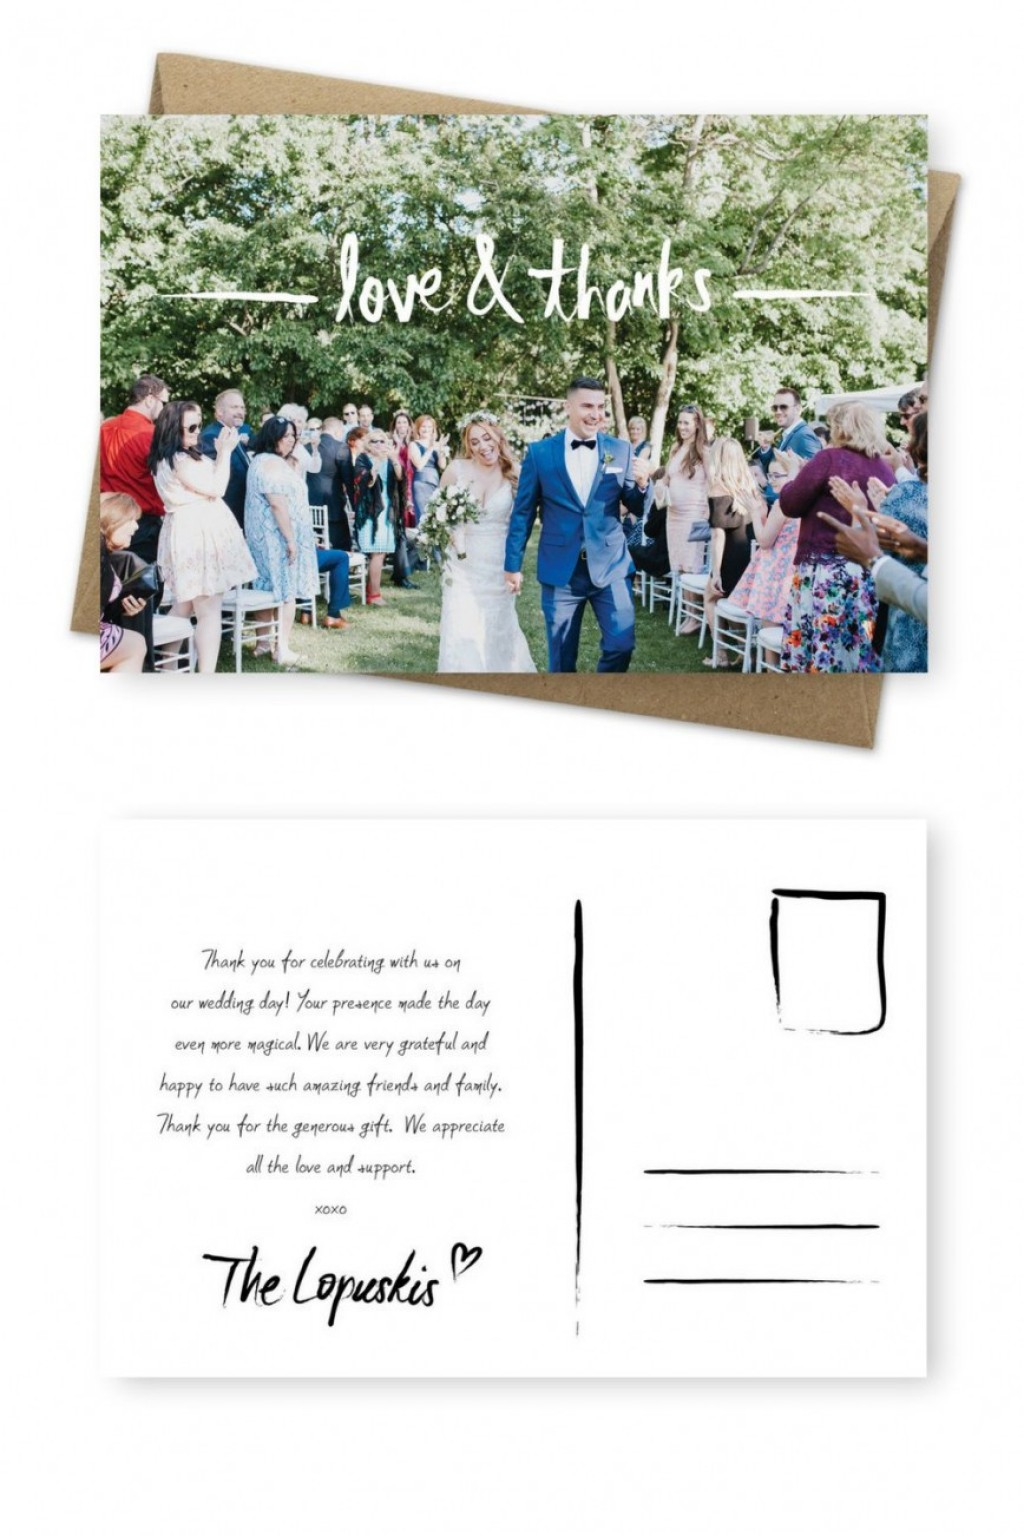 000 Unusual Thank You Card Template Wedding Idea  Free Printable PublisherLarge